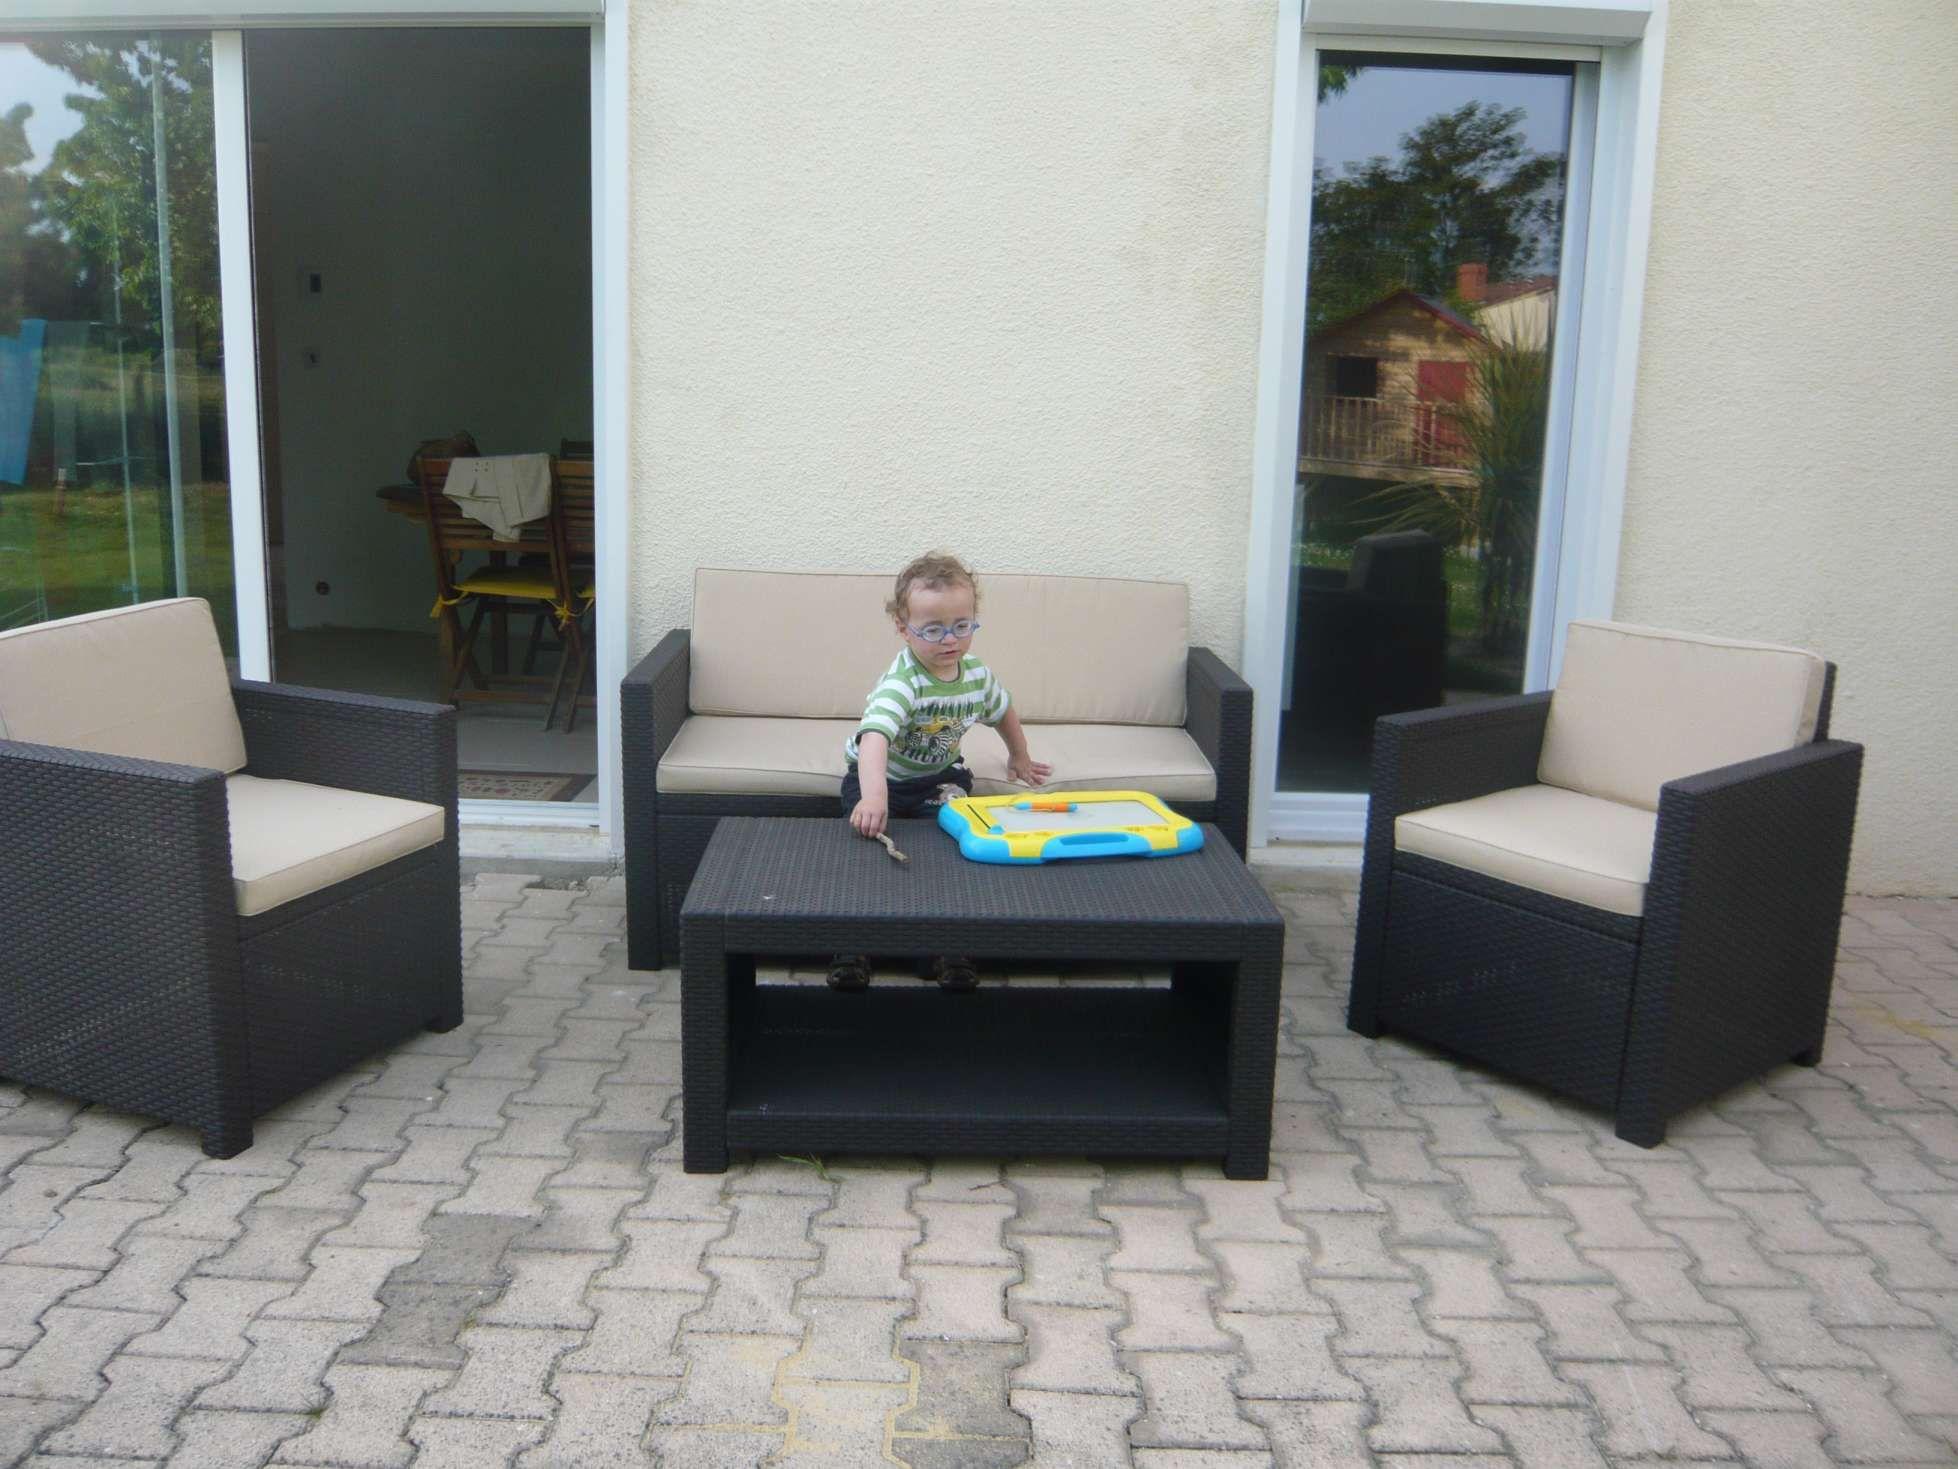 outdoor furniture outdoor decor